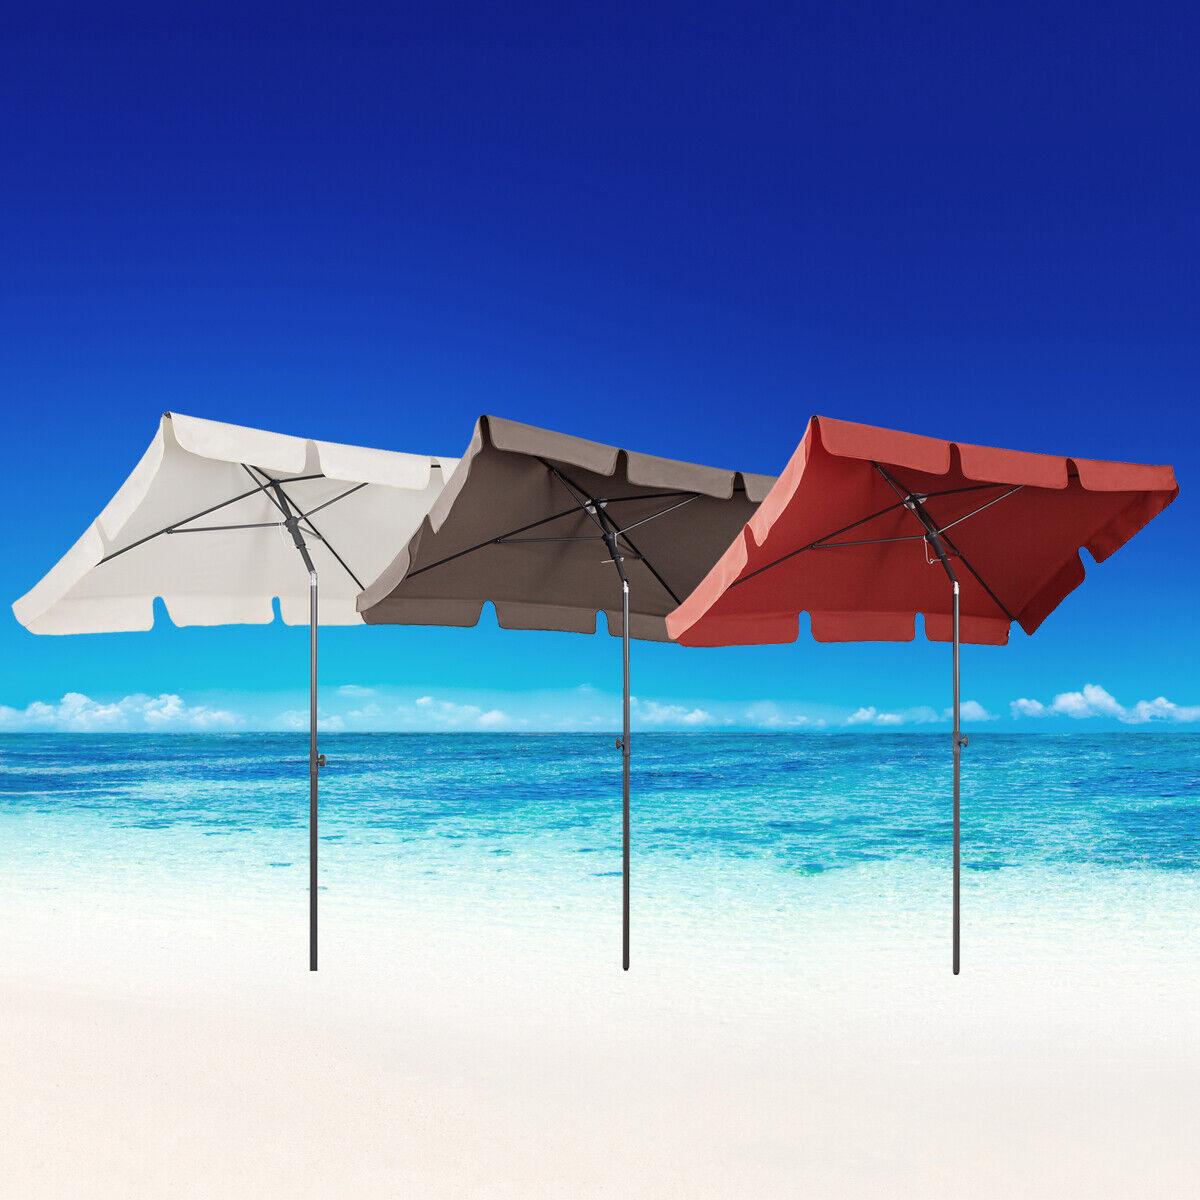 Sonnenschirm Rechteckig Balkonschirm Strandschirm Marktschirm knickbar 3 Farbe